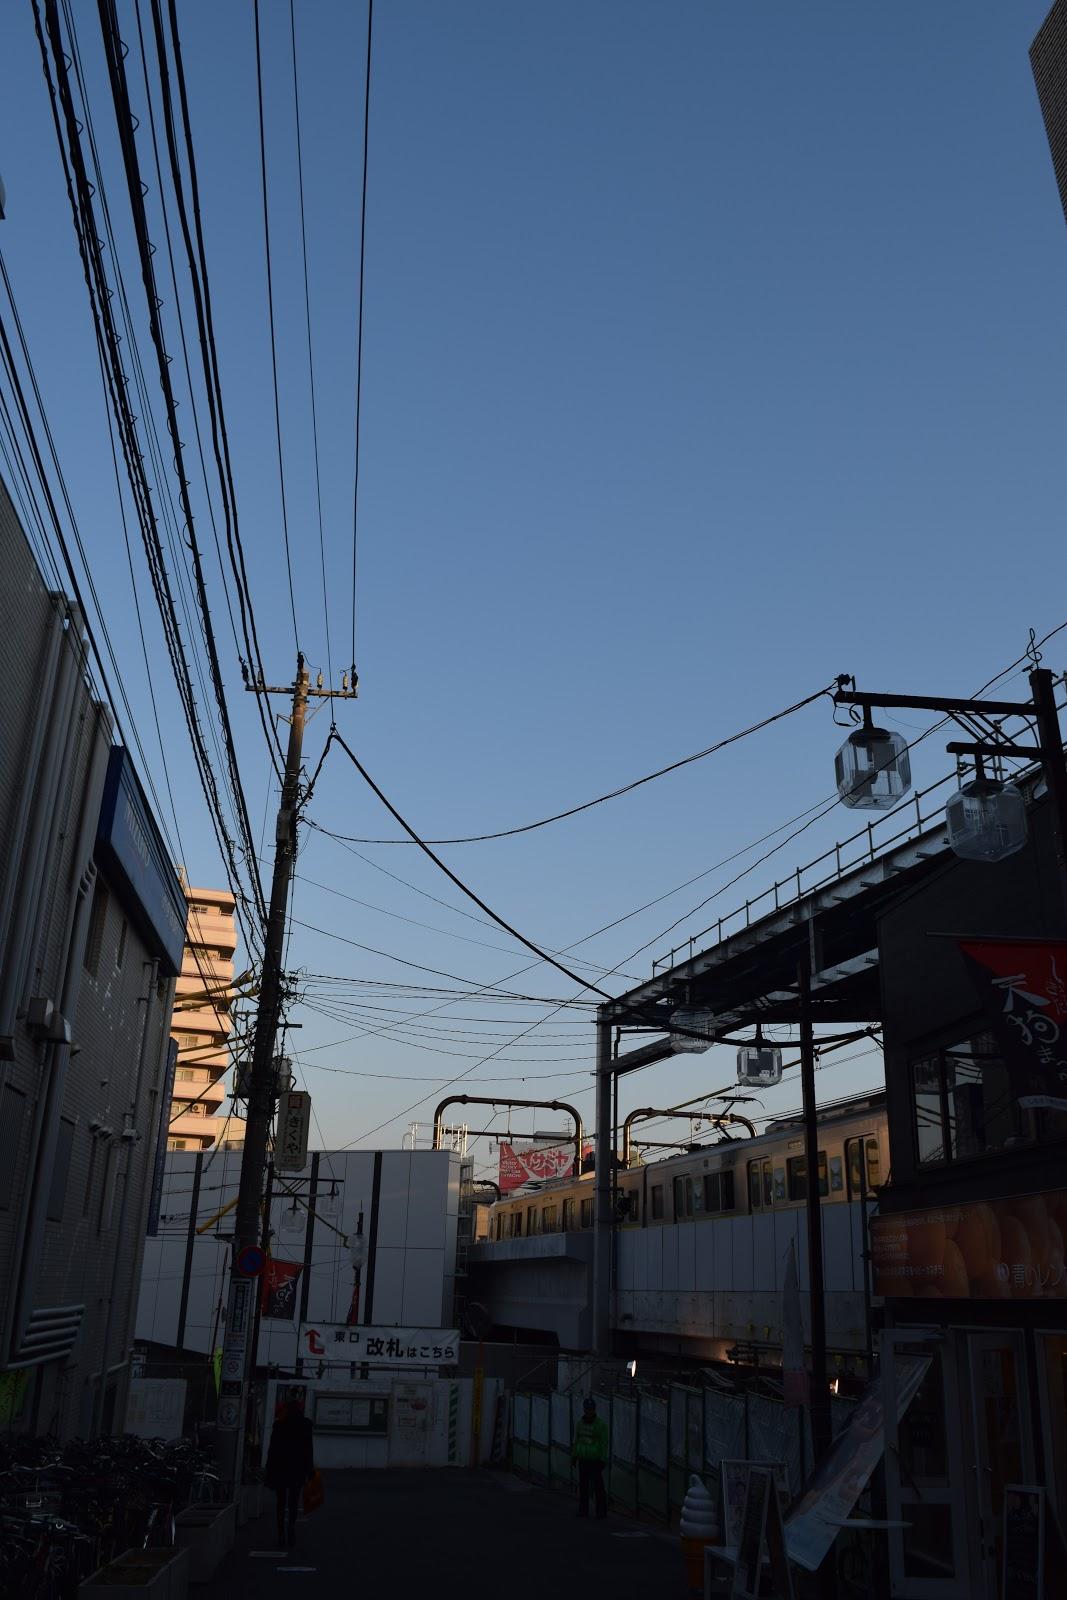 A street in Shimokitazawa, Tokyo